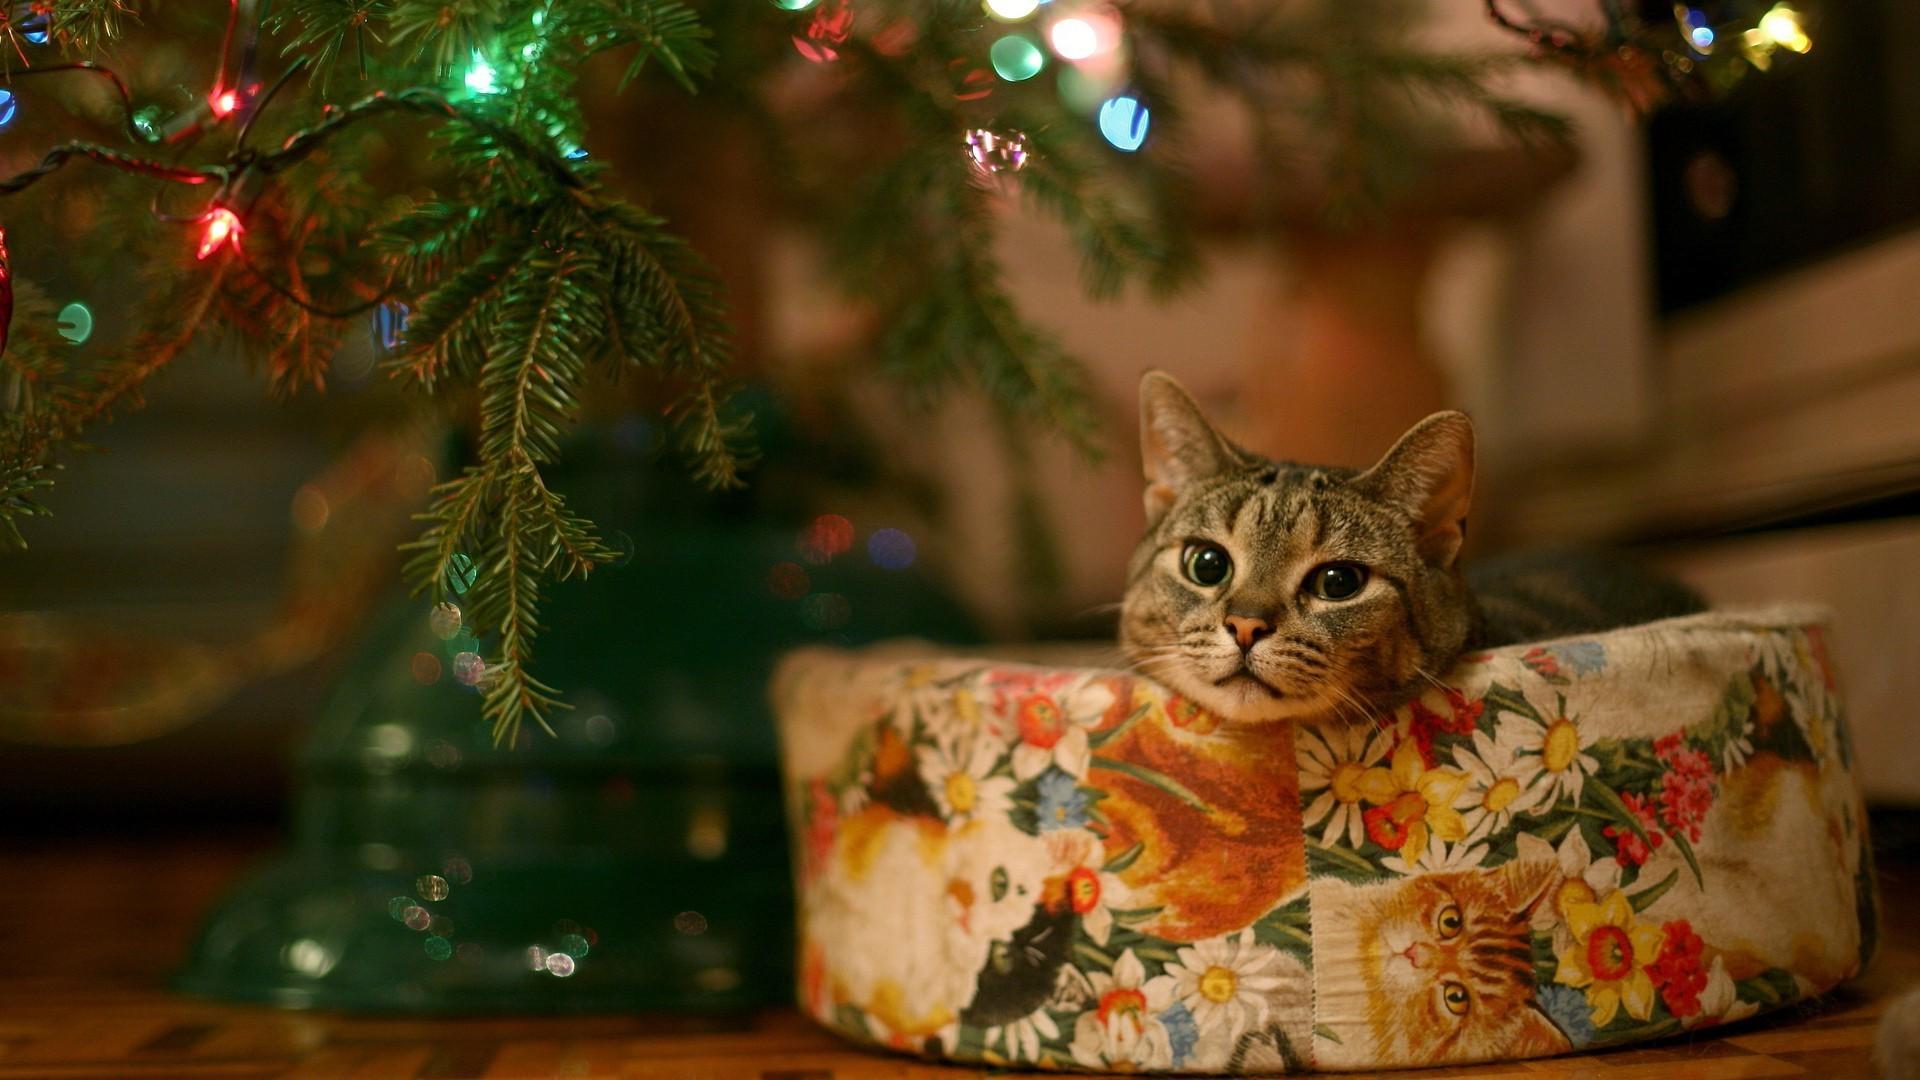 Cat under Christmas tree Widescreen Wallpaper – #2403